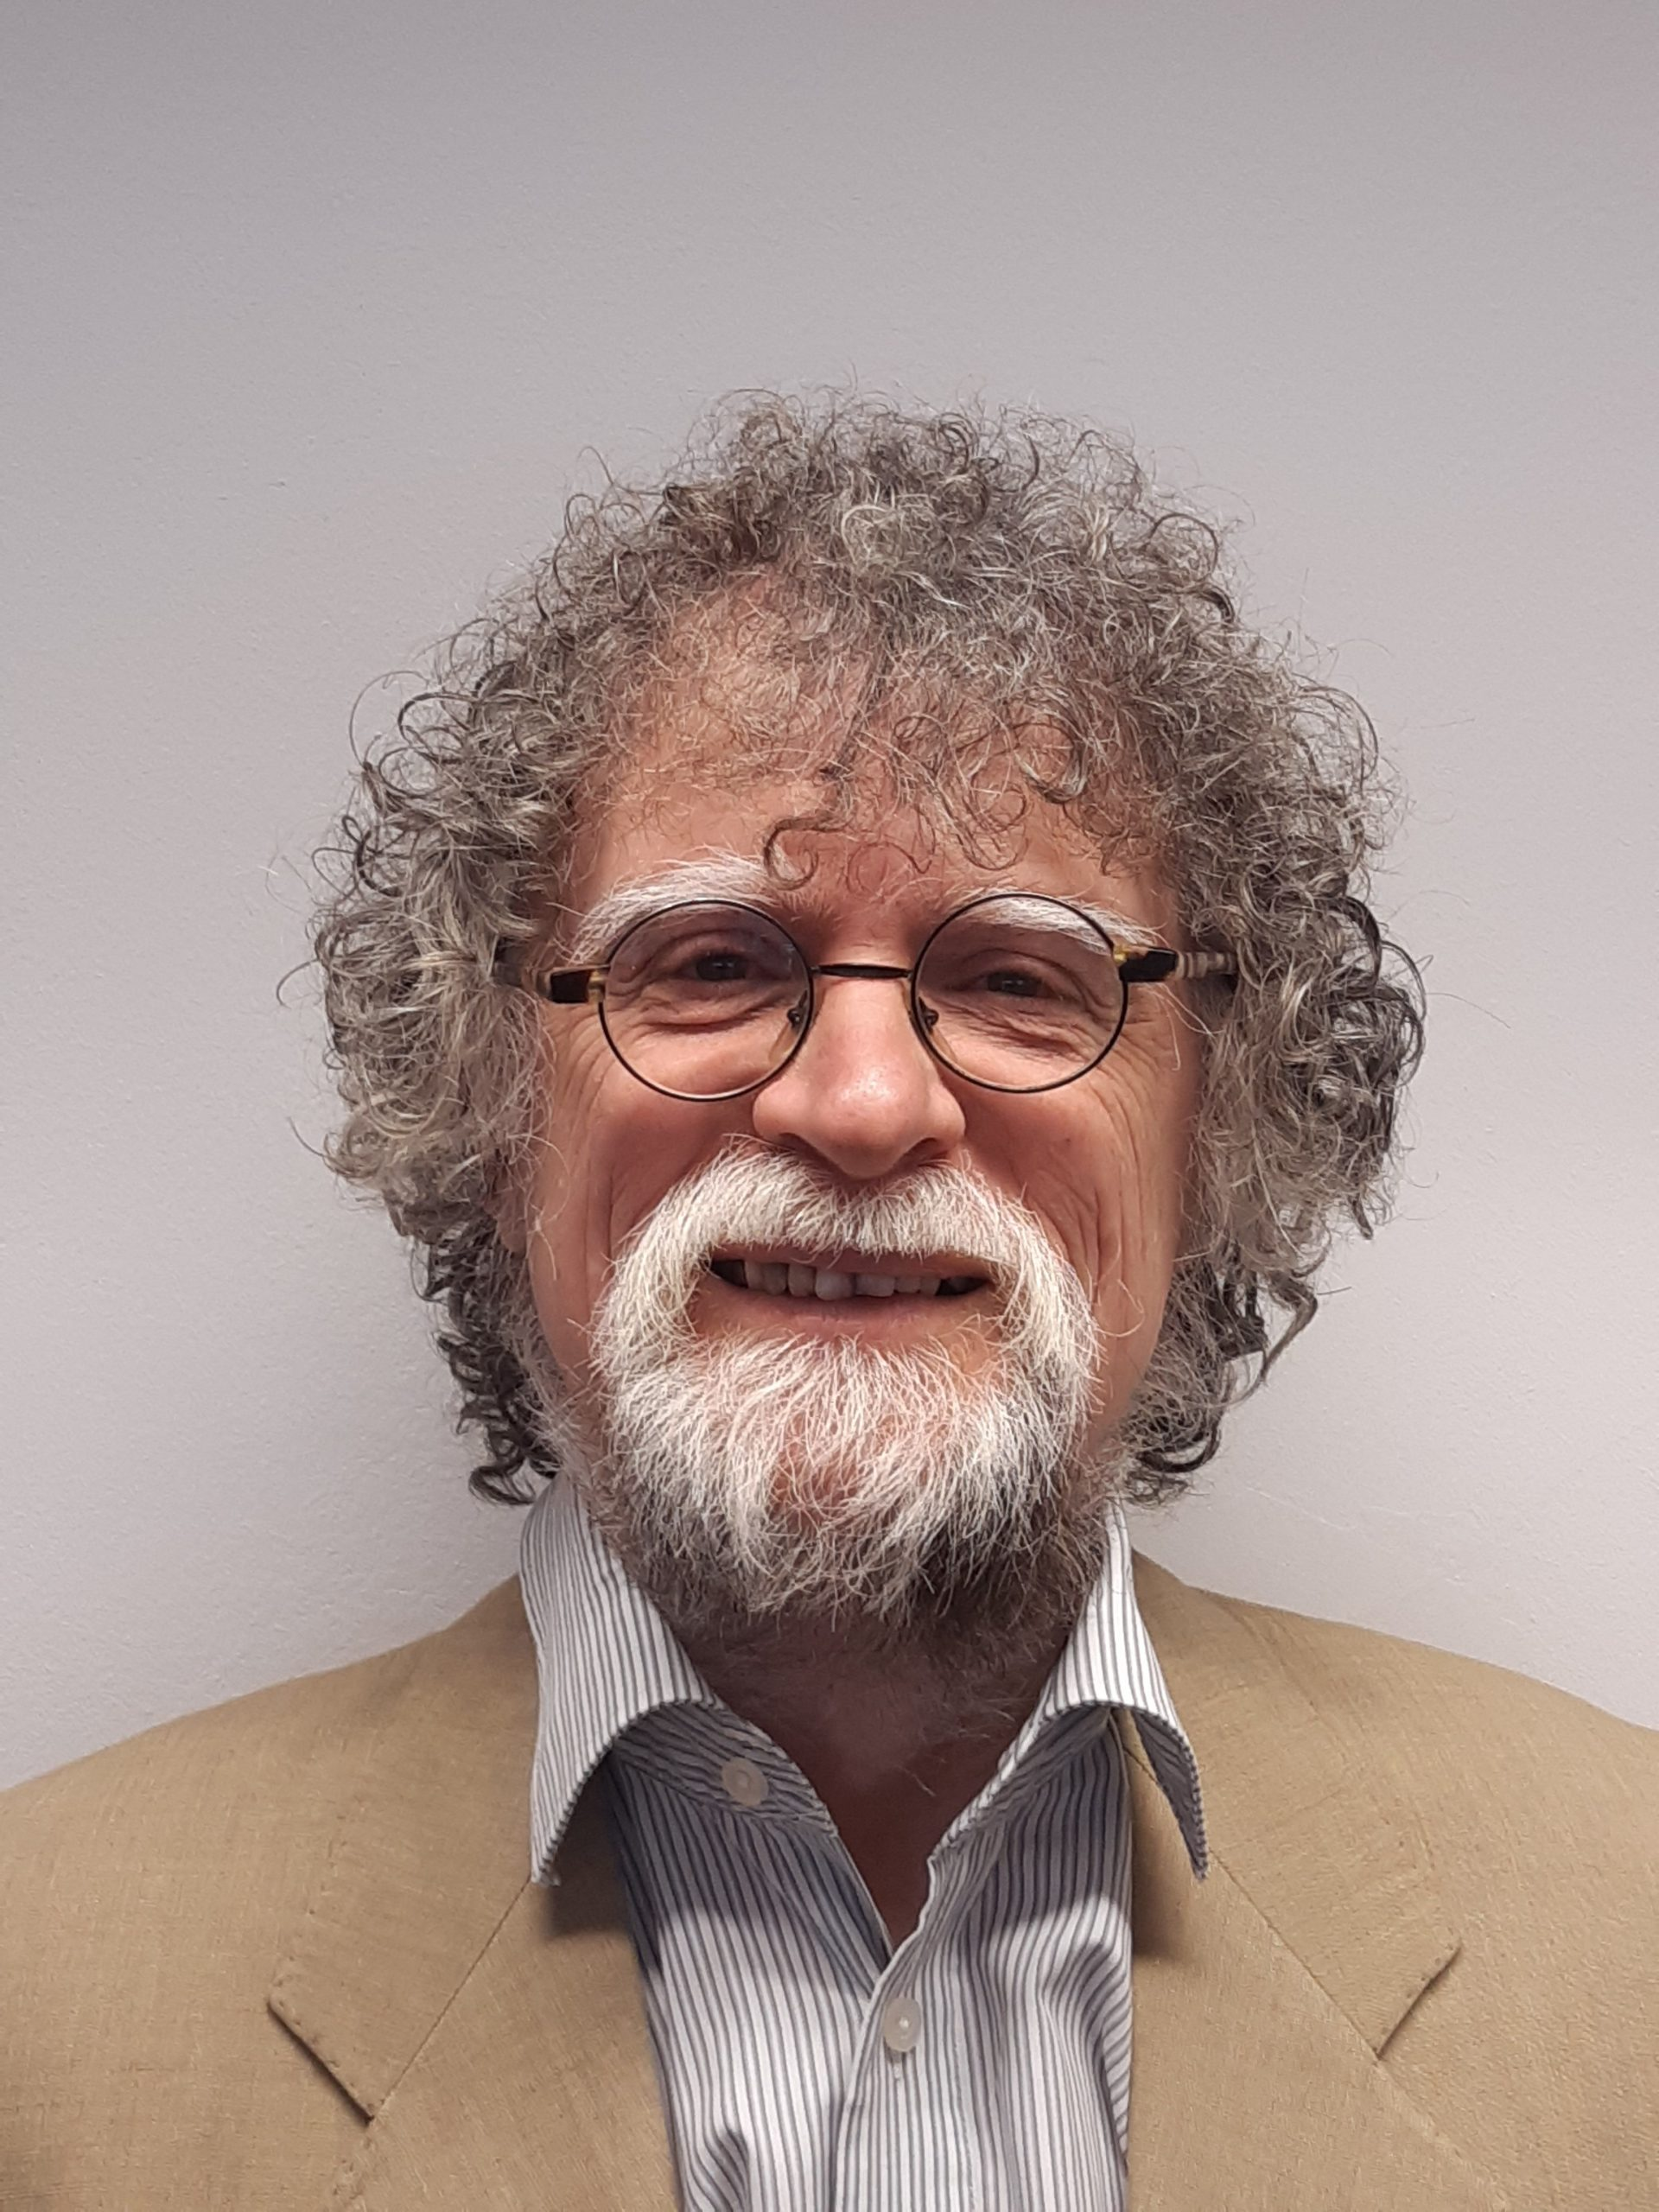 Peter Judex